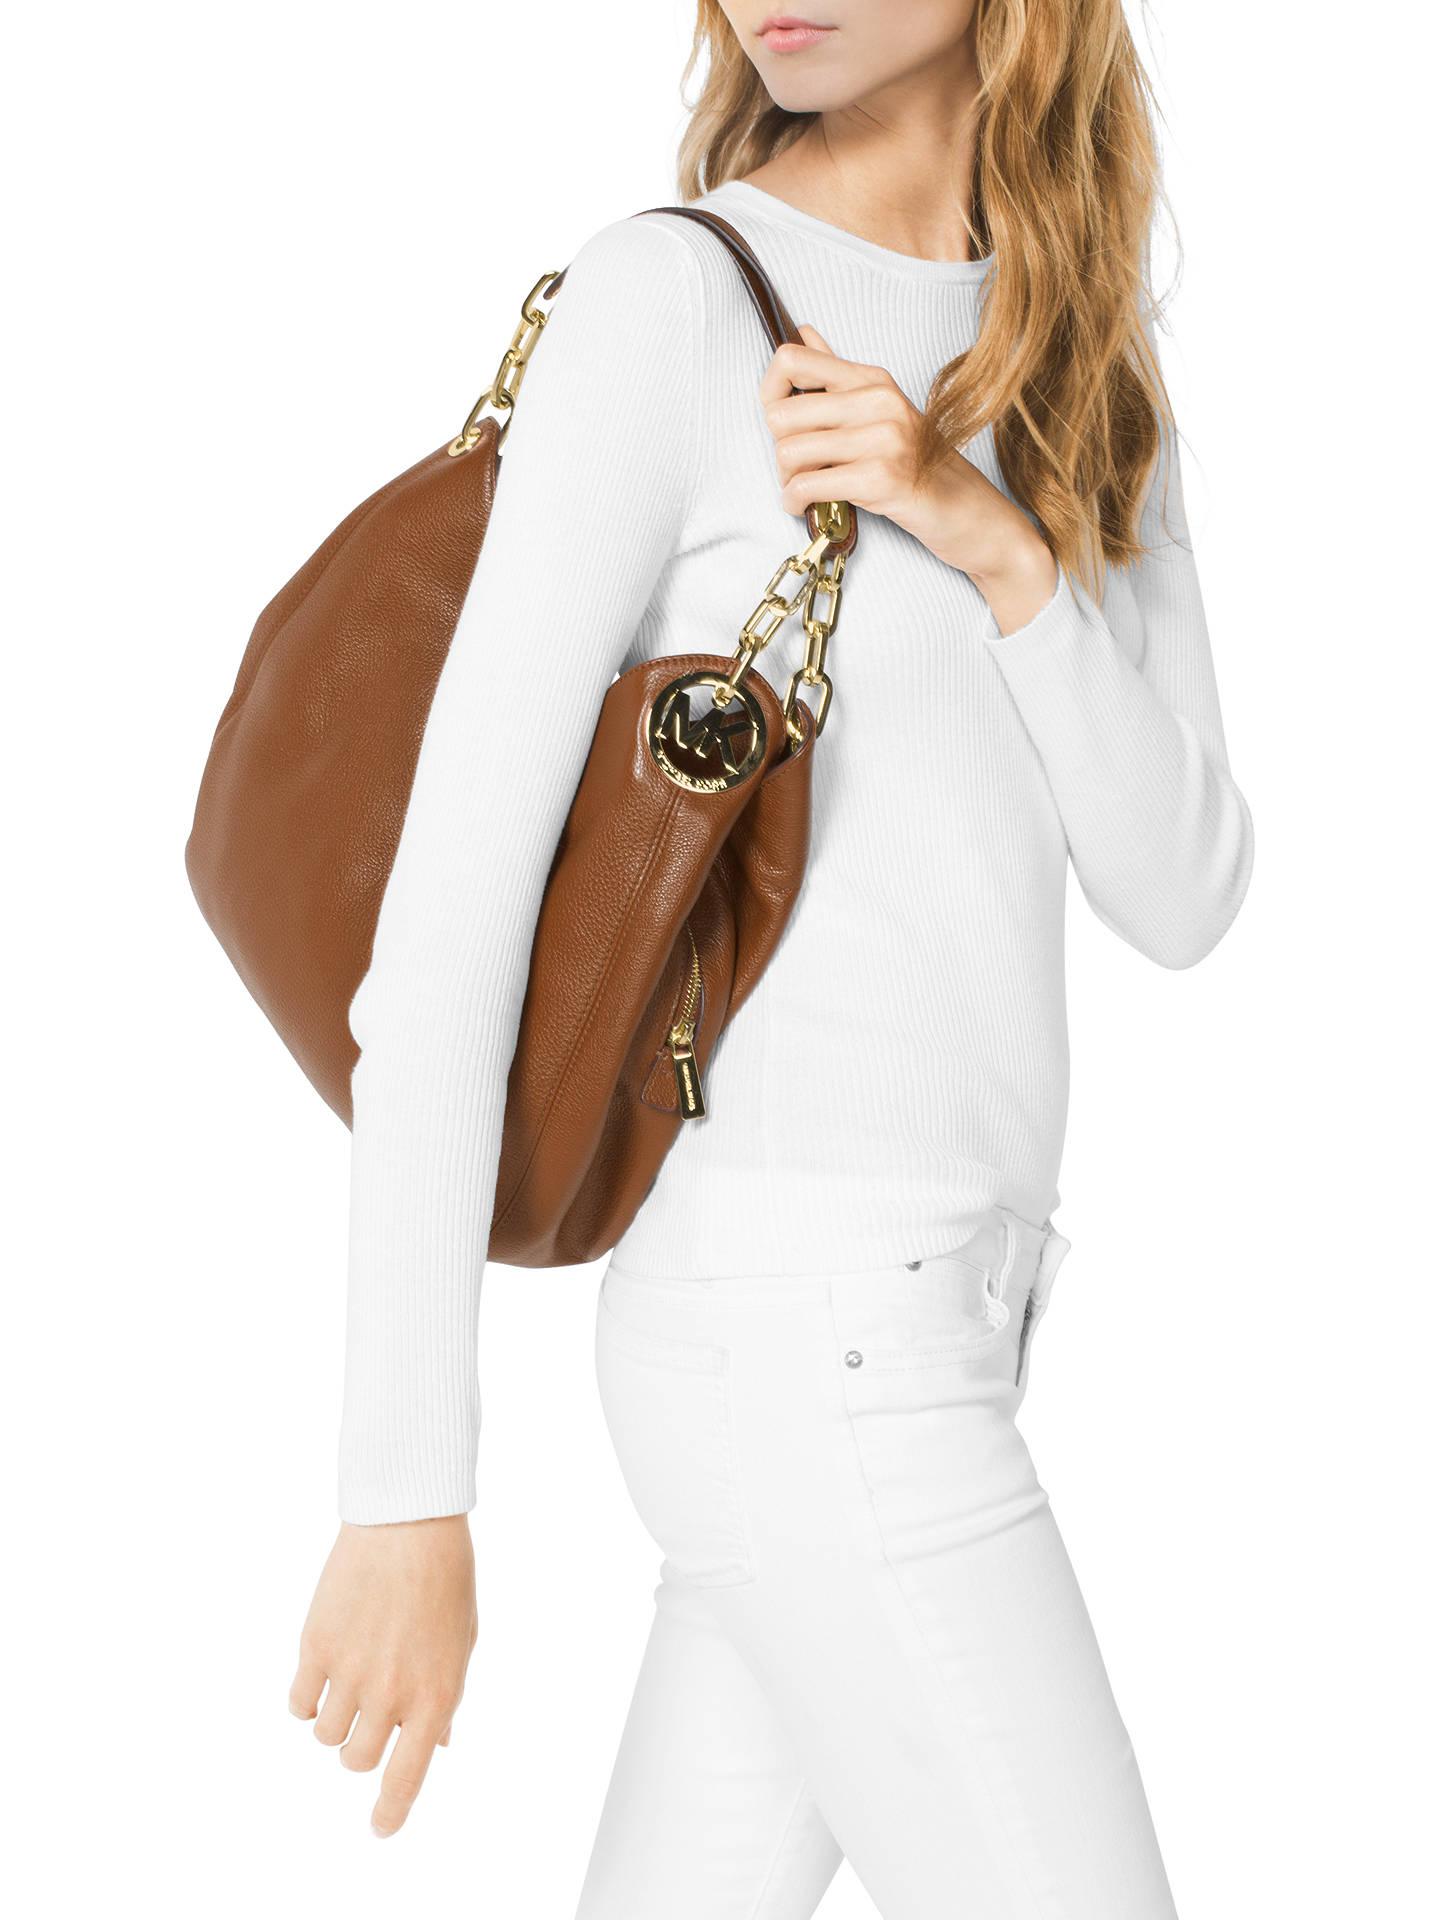 ceaa6690142 ... Buy MICHAEL Michael Kors Fulton Leather Large Shoulder Bag, Acorn  Online at johnlewis.com